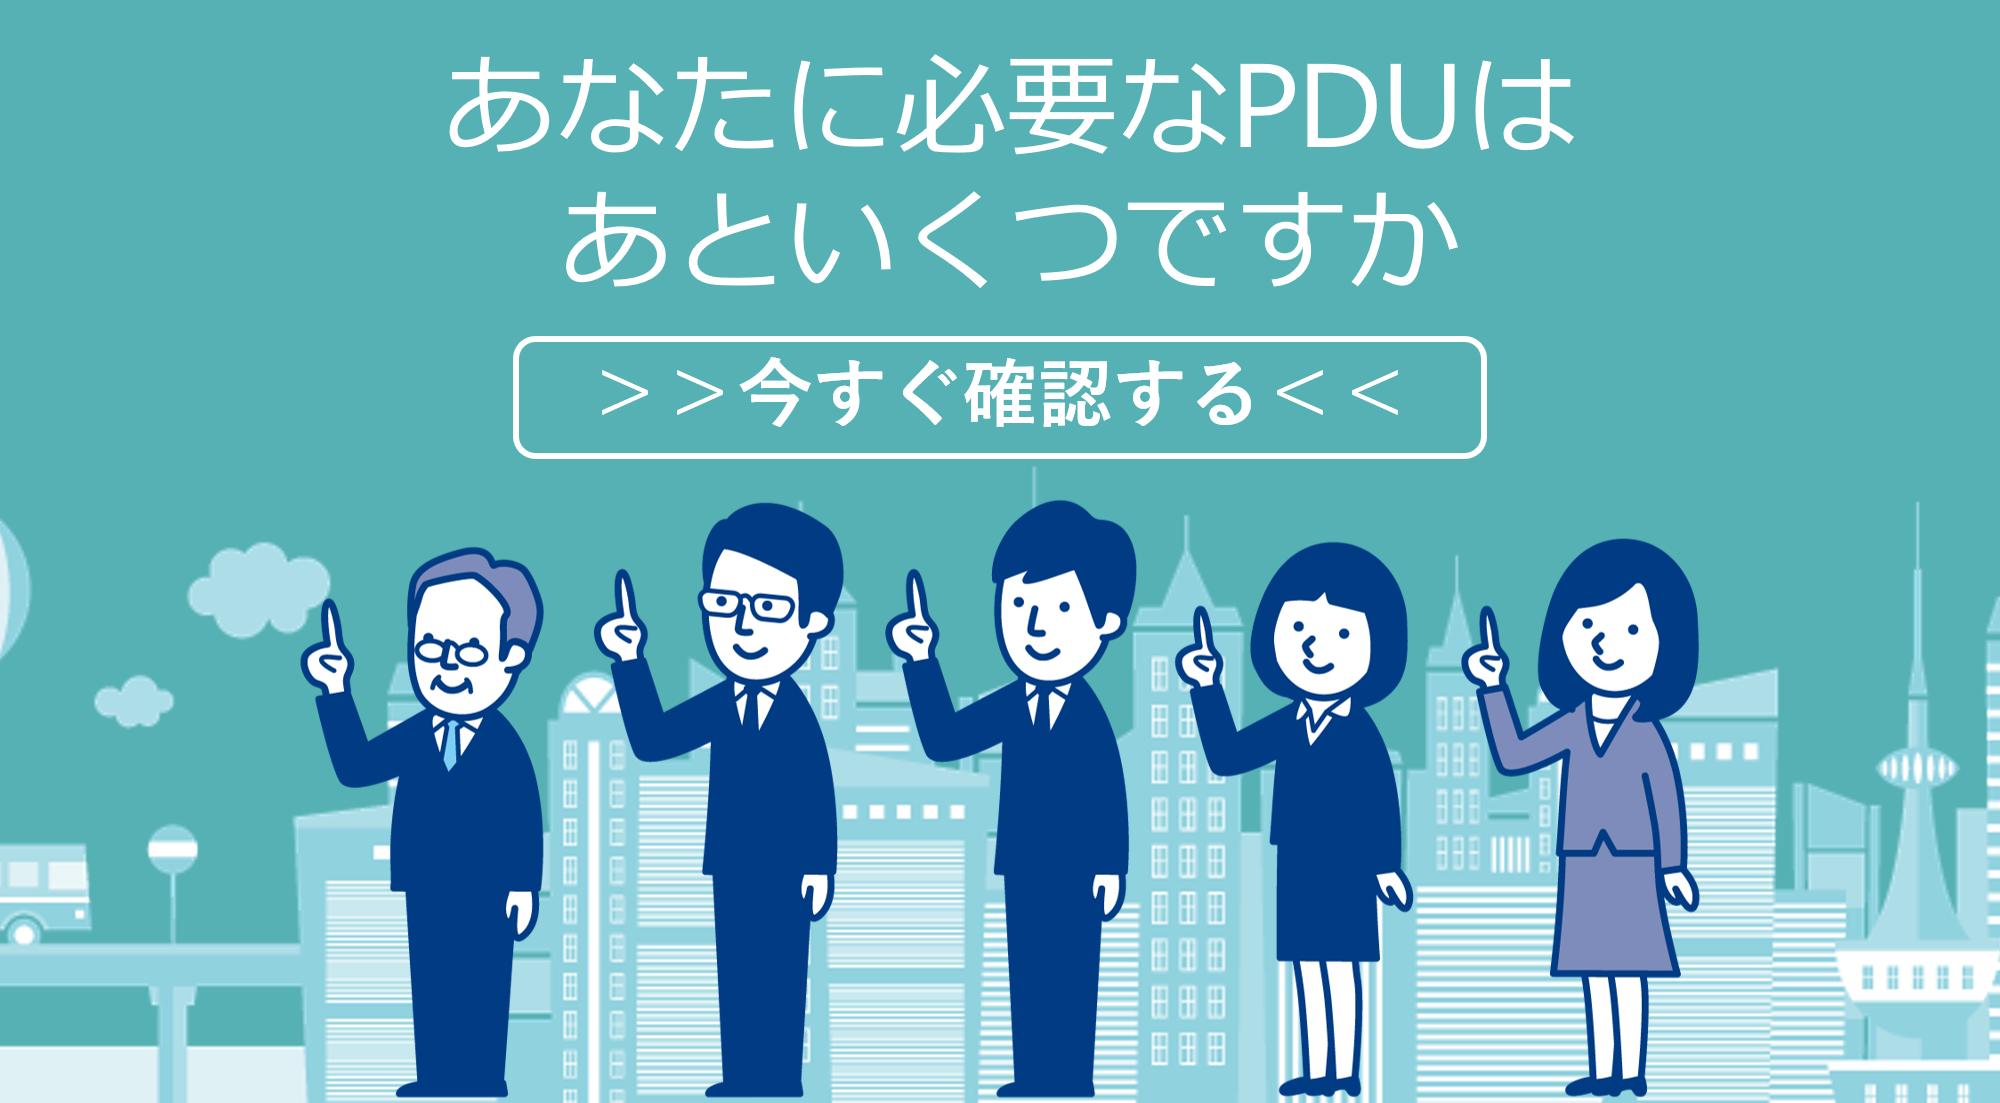 PMP®を更新するために、あなたに必要なPDUはあといくつでしょうか。さっそく確認をしよう!